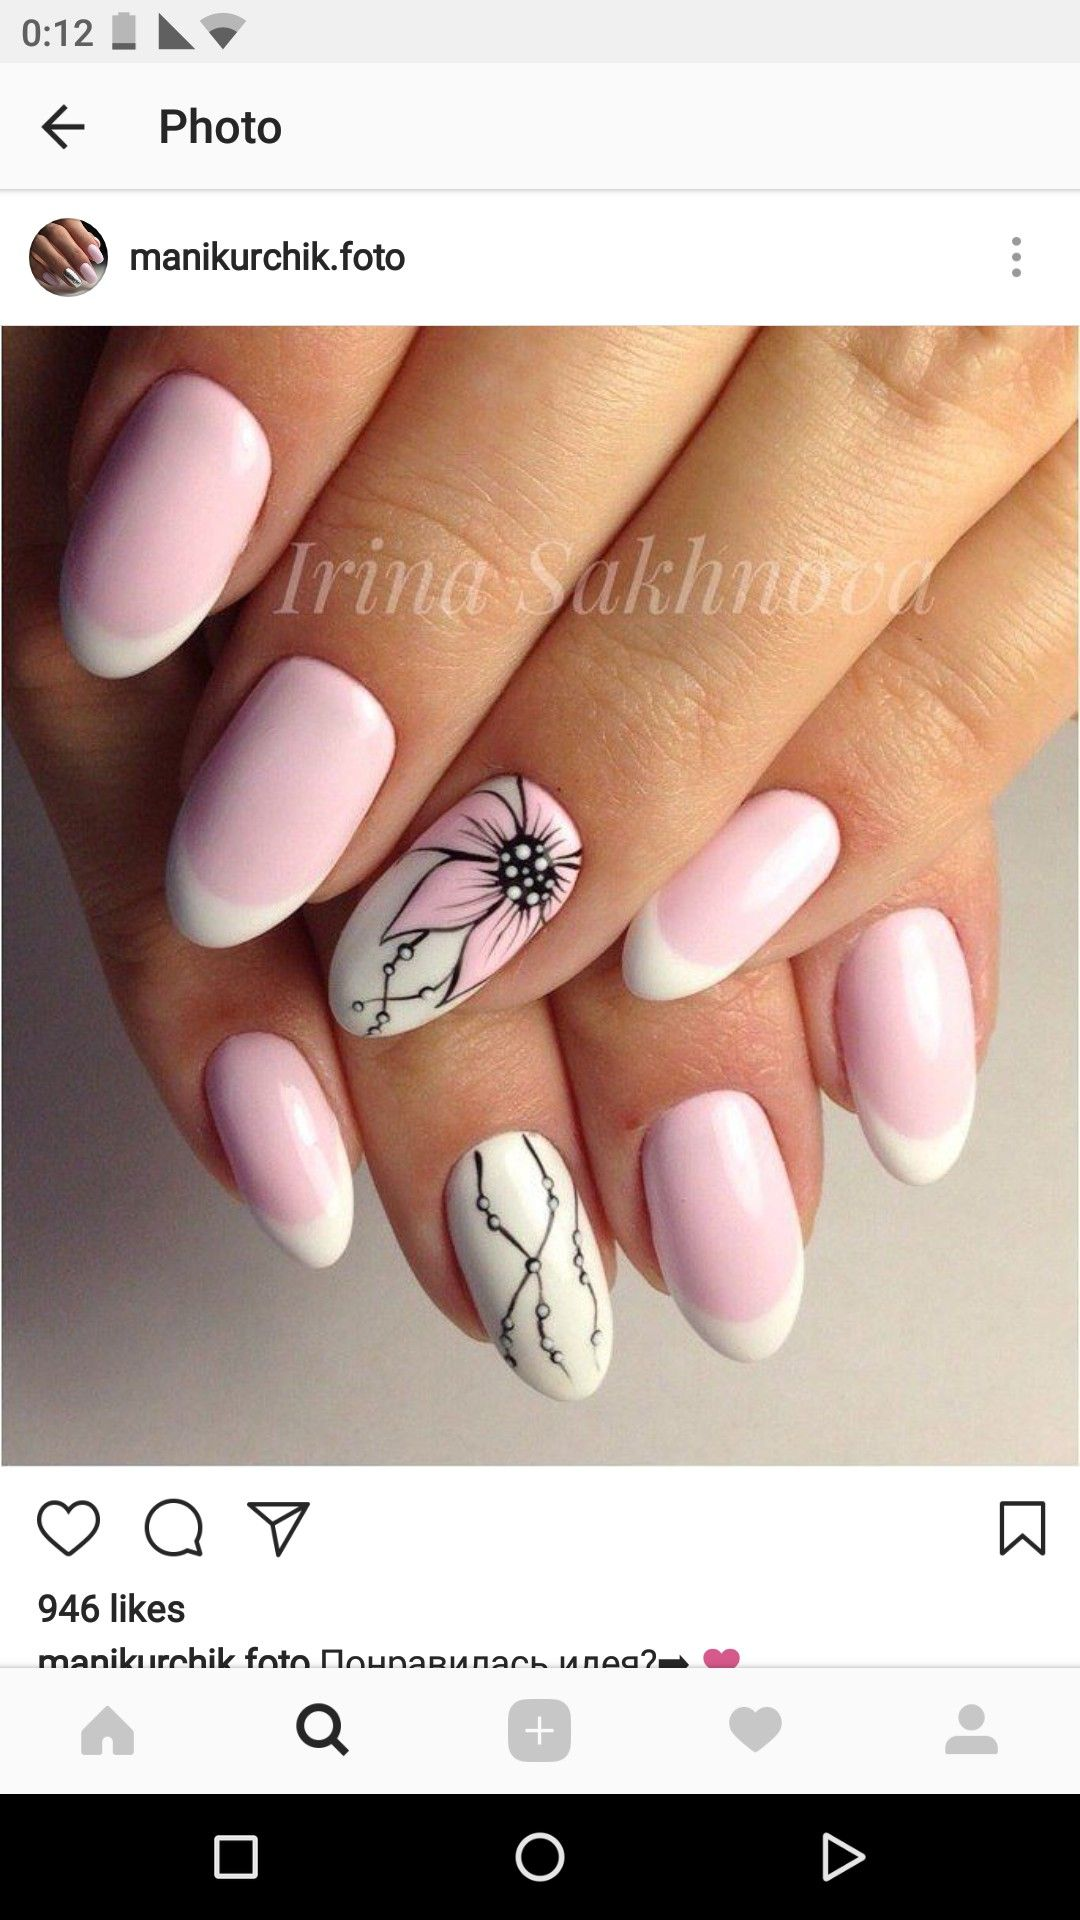 Pin by Ντίνα ΚΔ on Ntina | Pinterest | Manicure, Stylish nails and ...